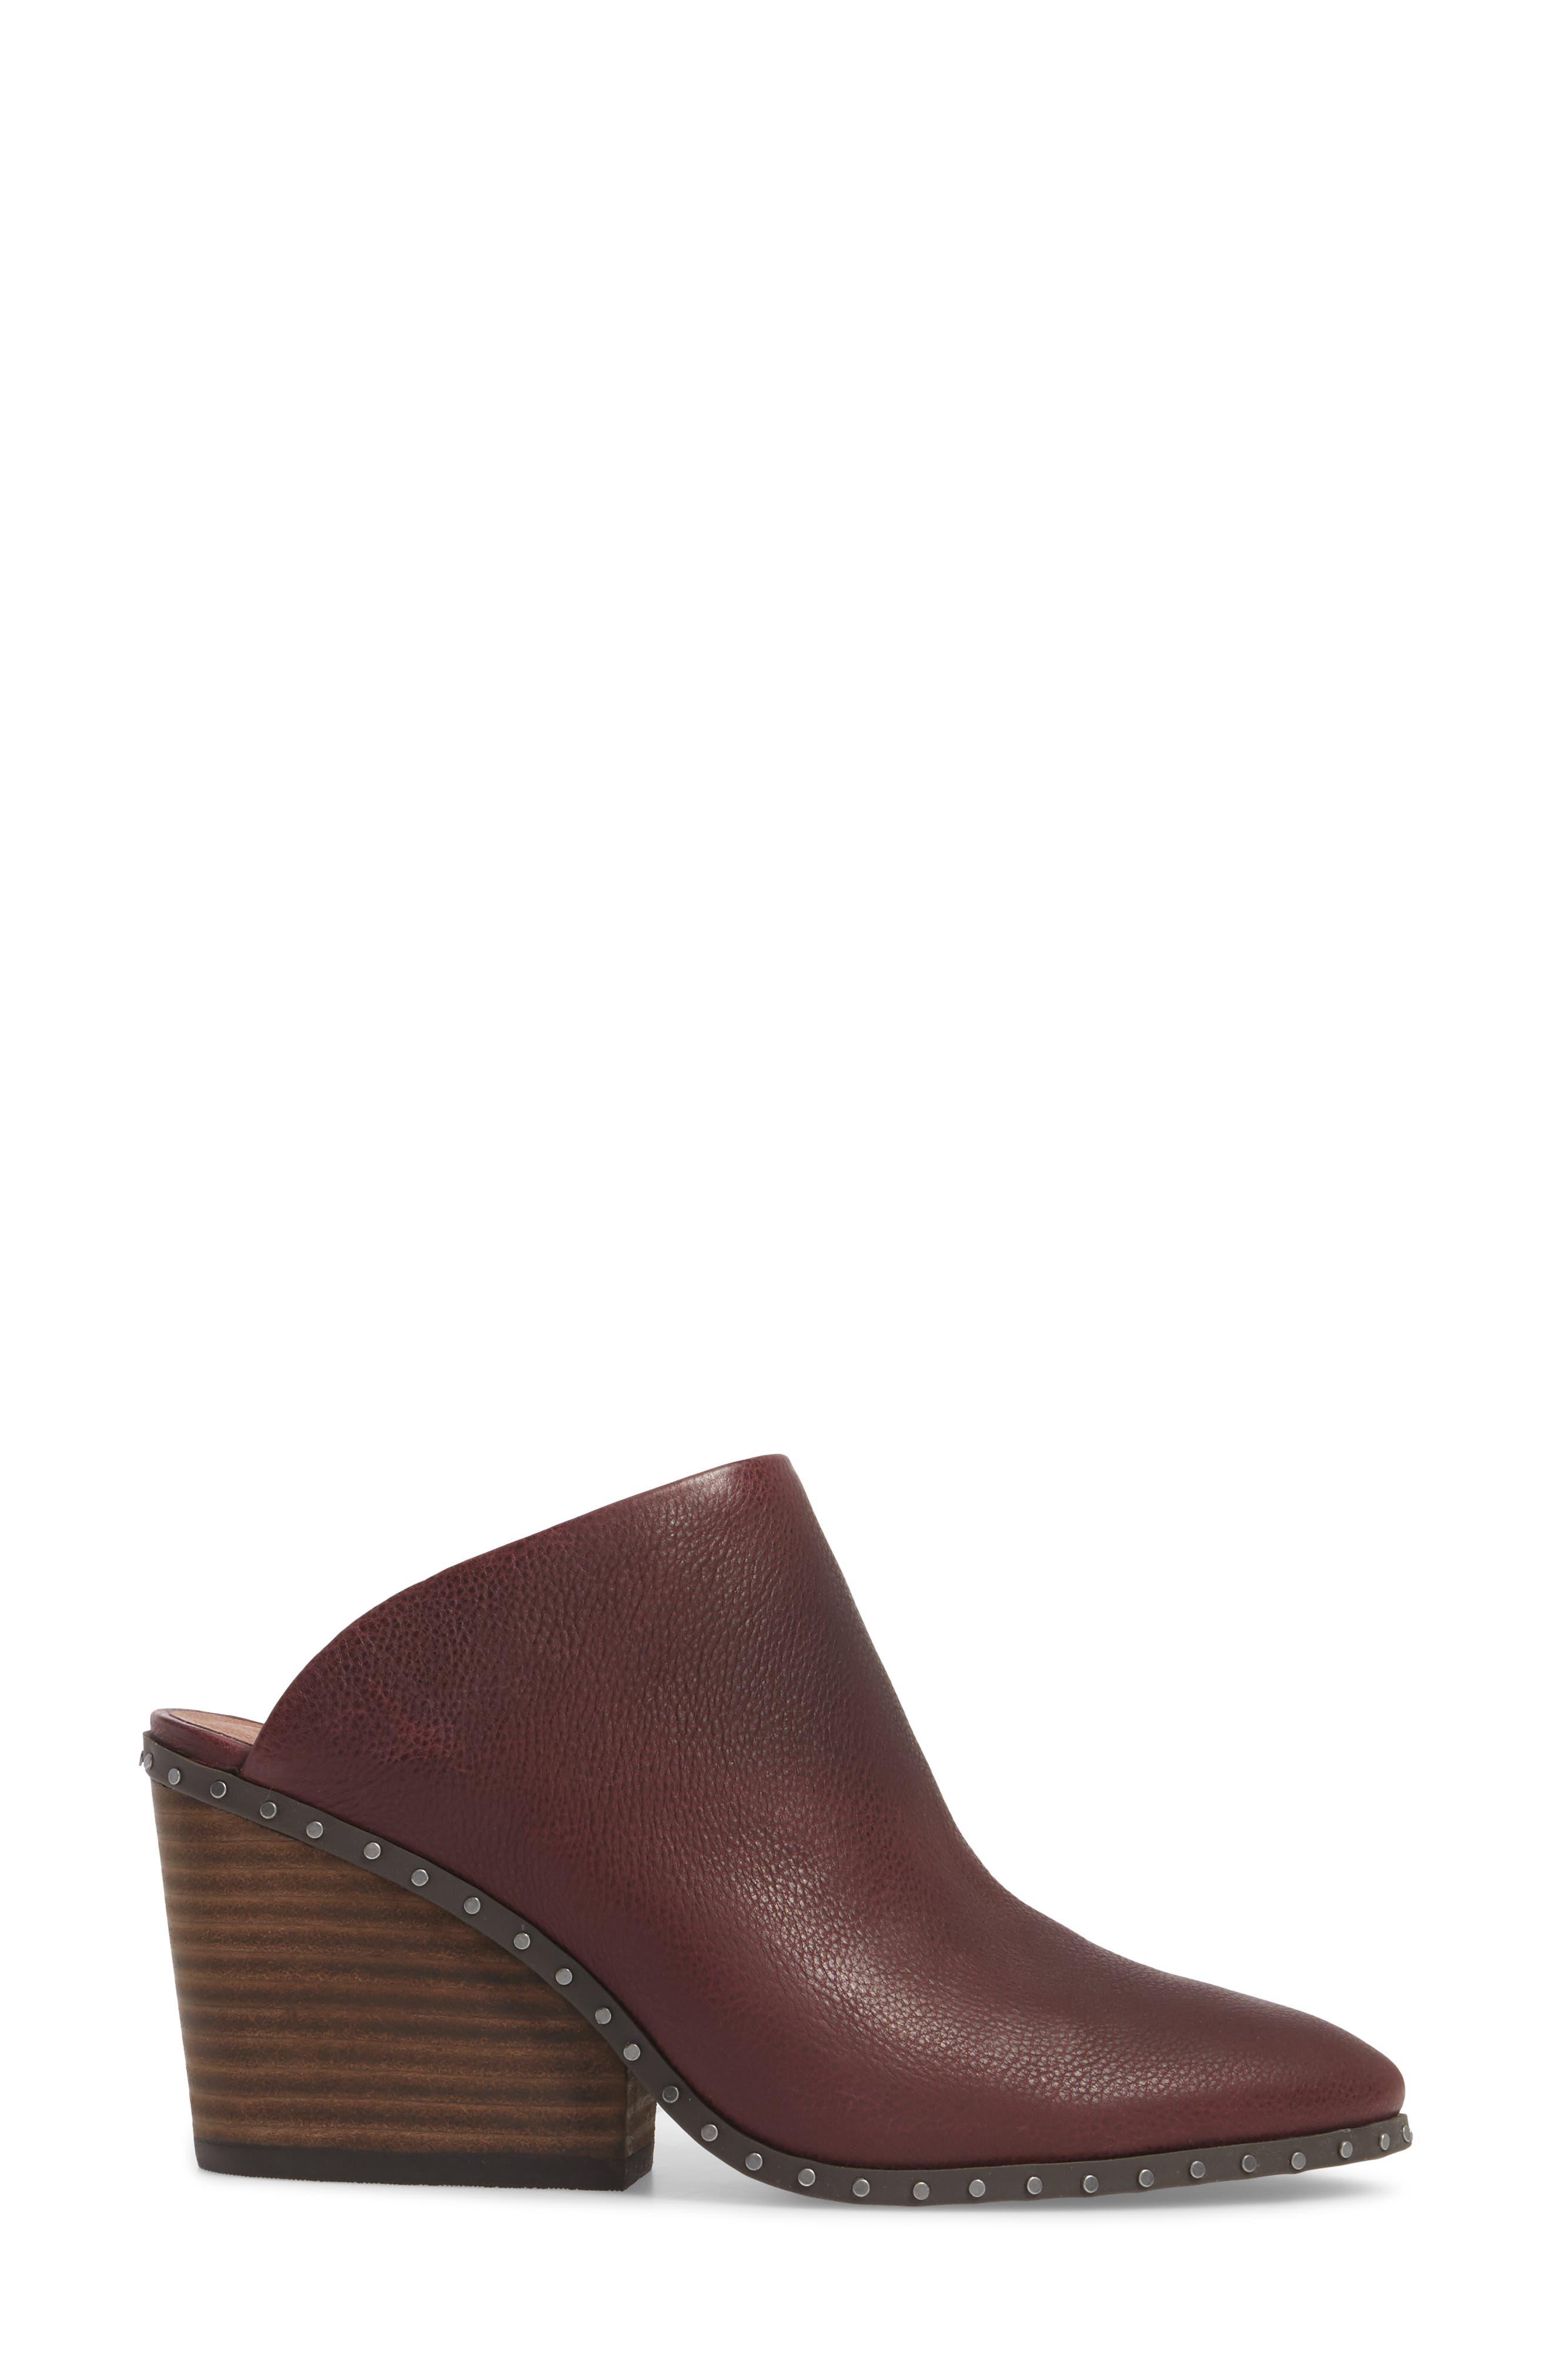 Larsson2 Studded Mule,                             Alternate thumbnail 3, color,                             Tawny Port Leather